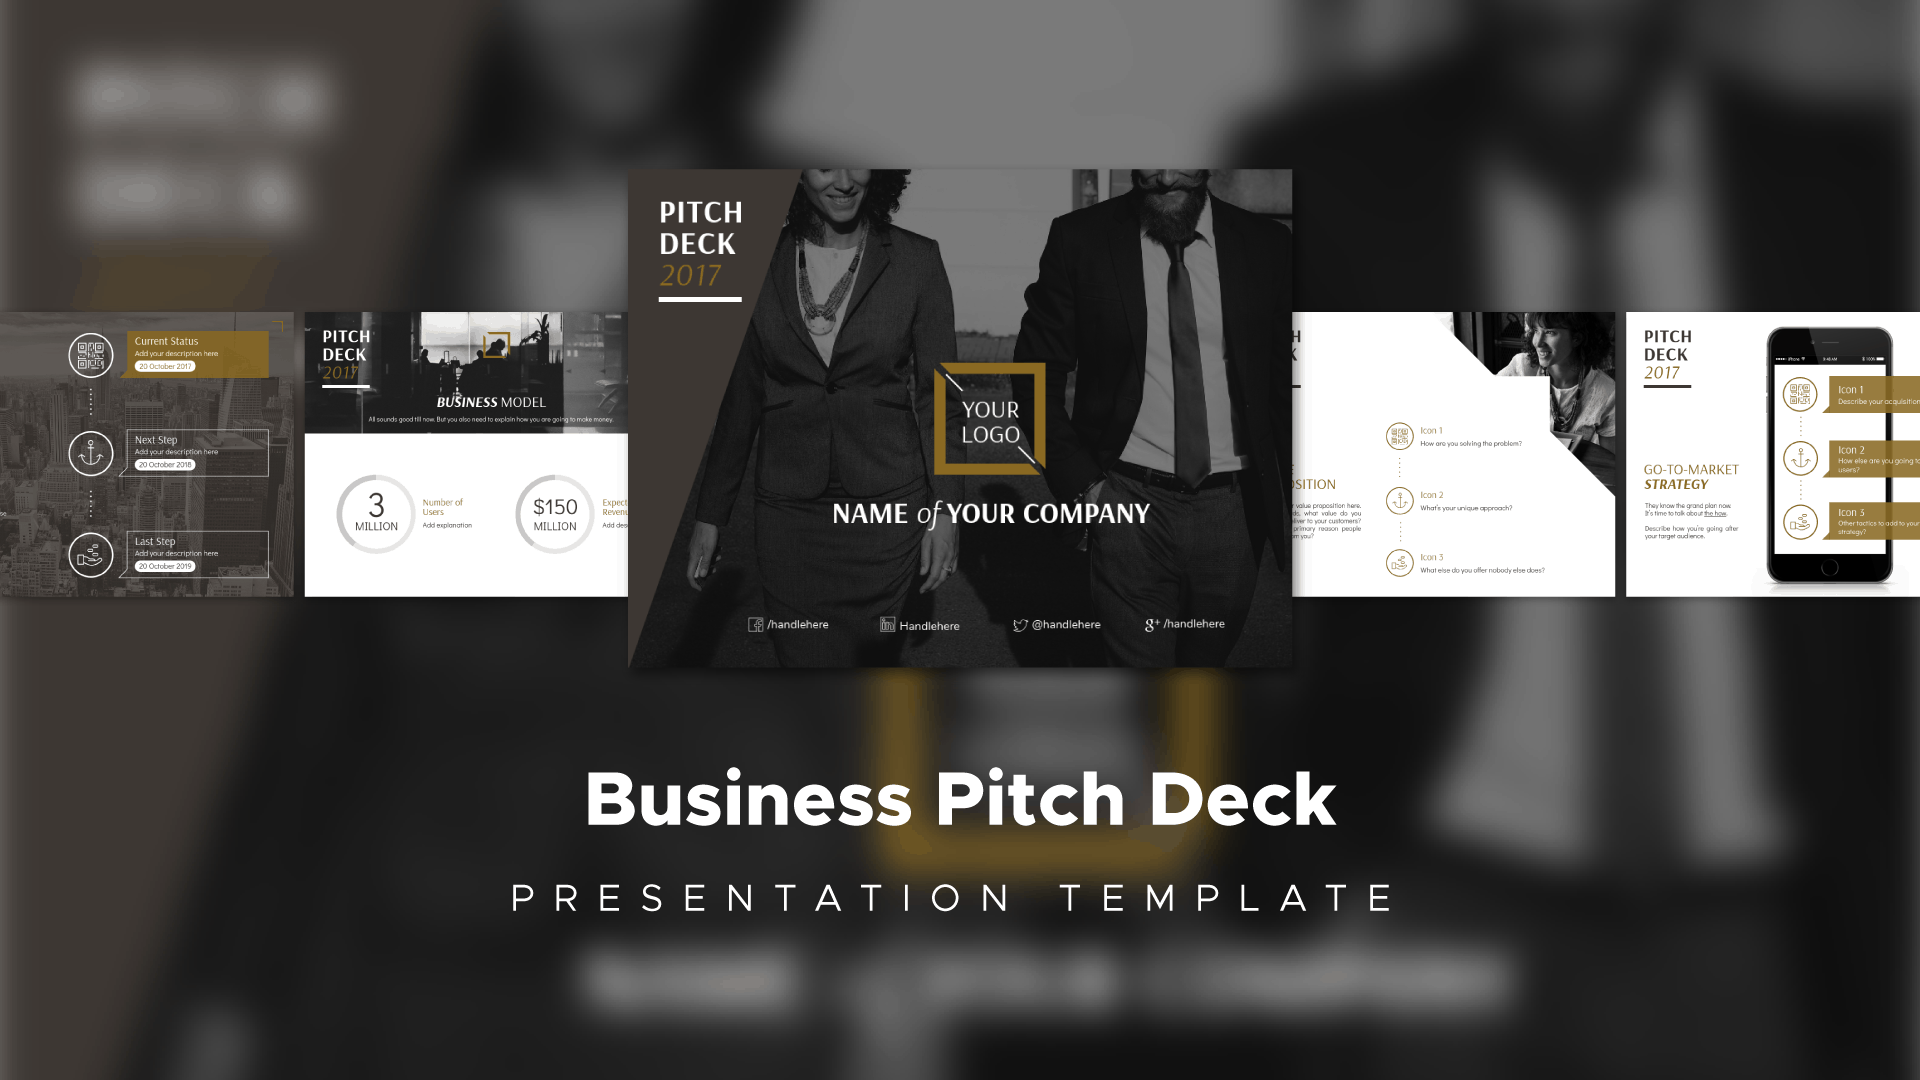 business pitch deck, pitch deck template, presentation template